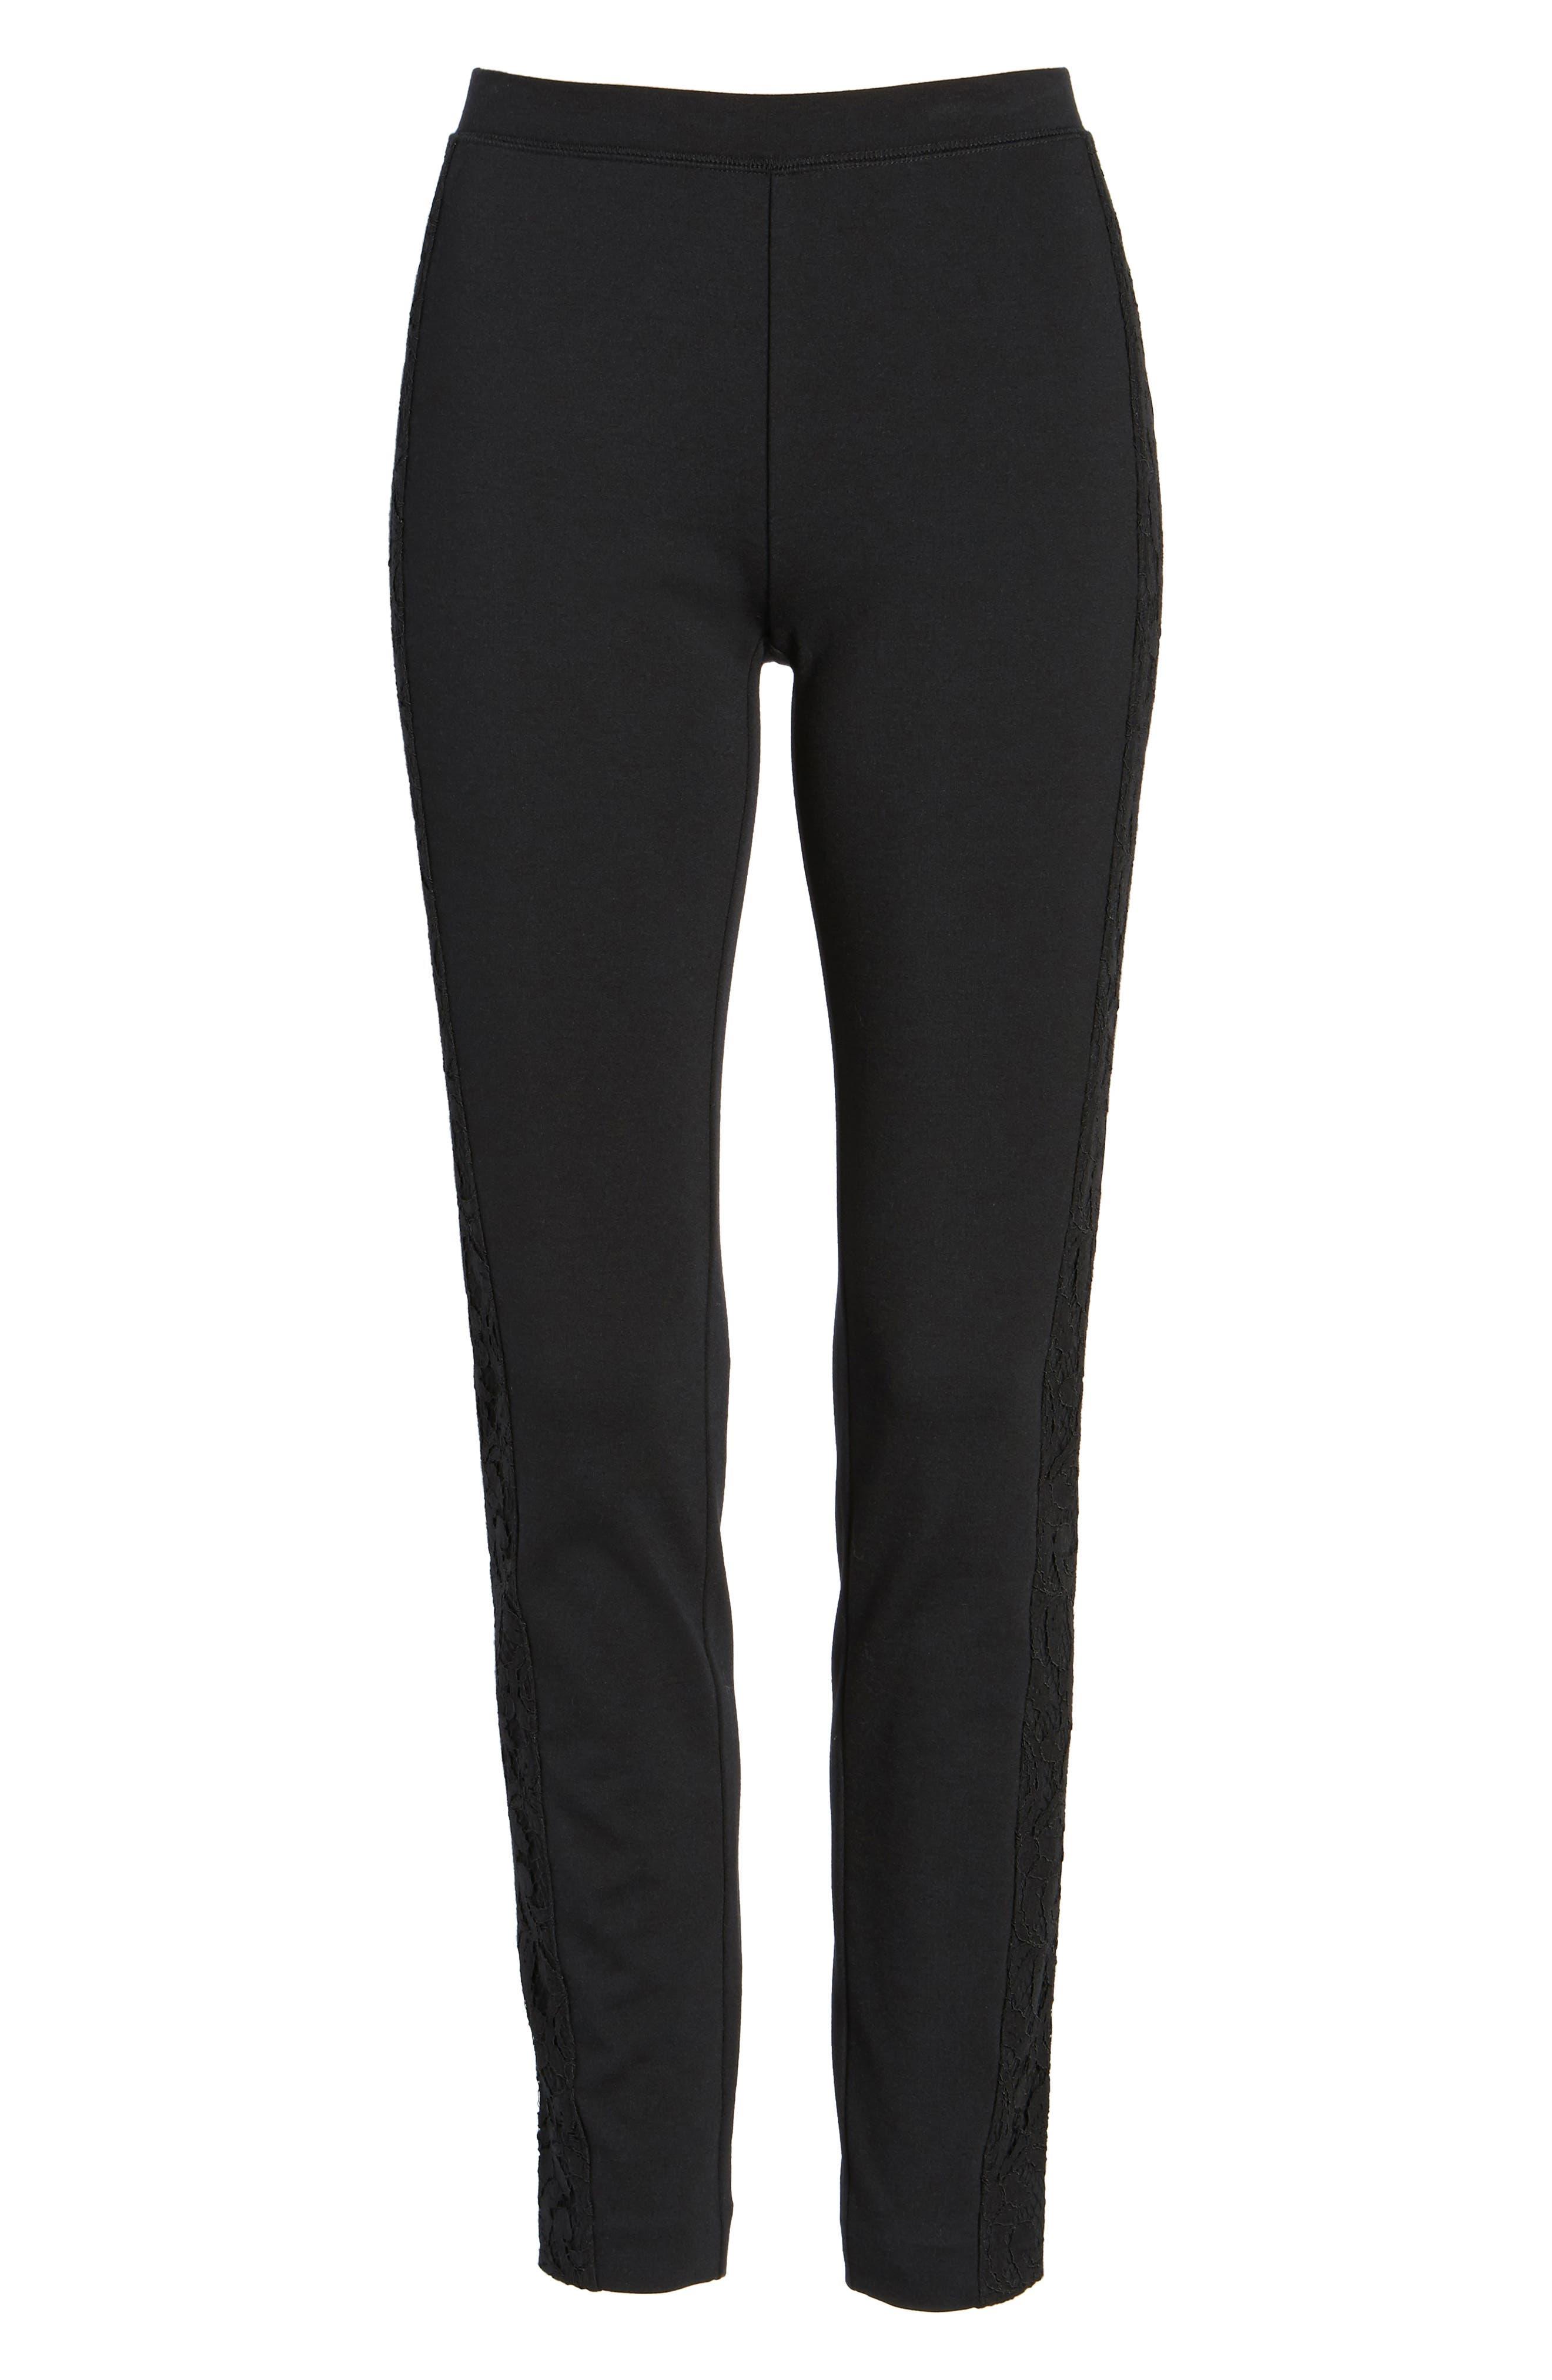 Lace Side Leggings,                             Alternate thumbnail 6, color,                             Black